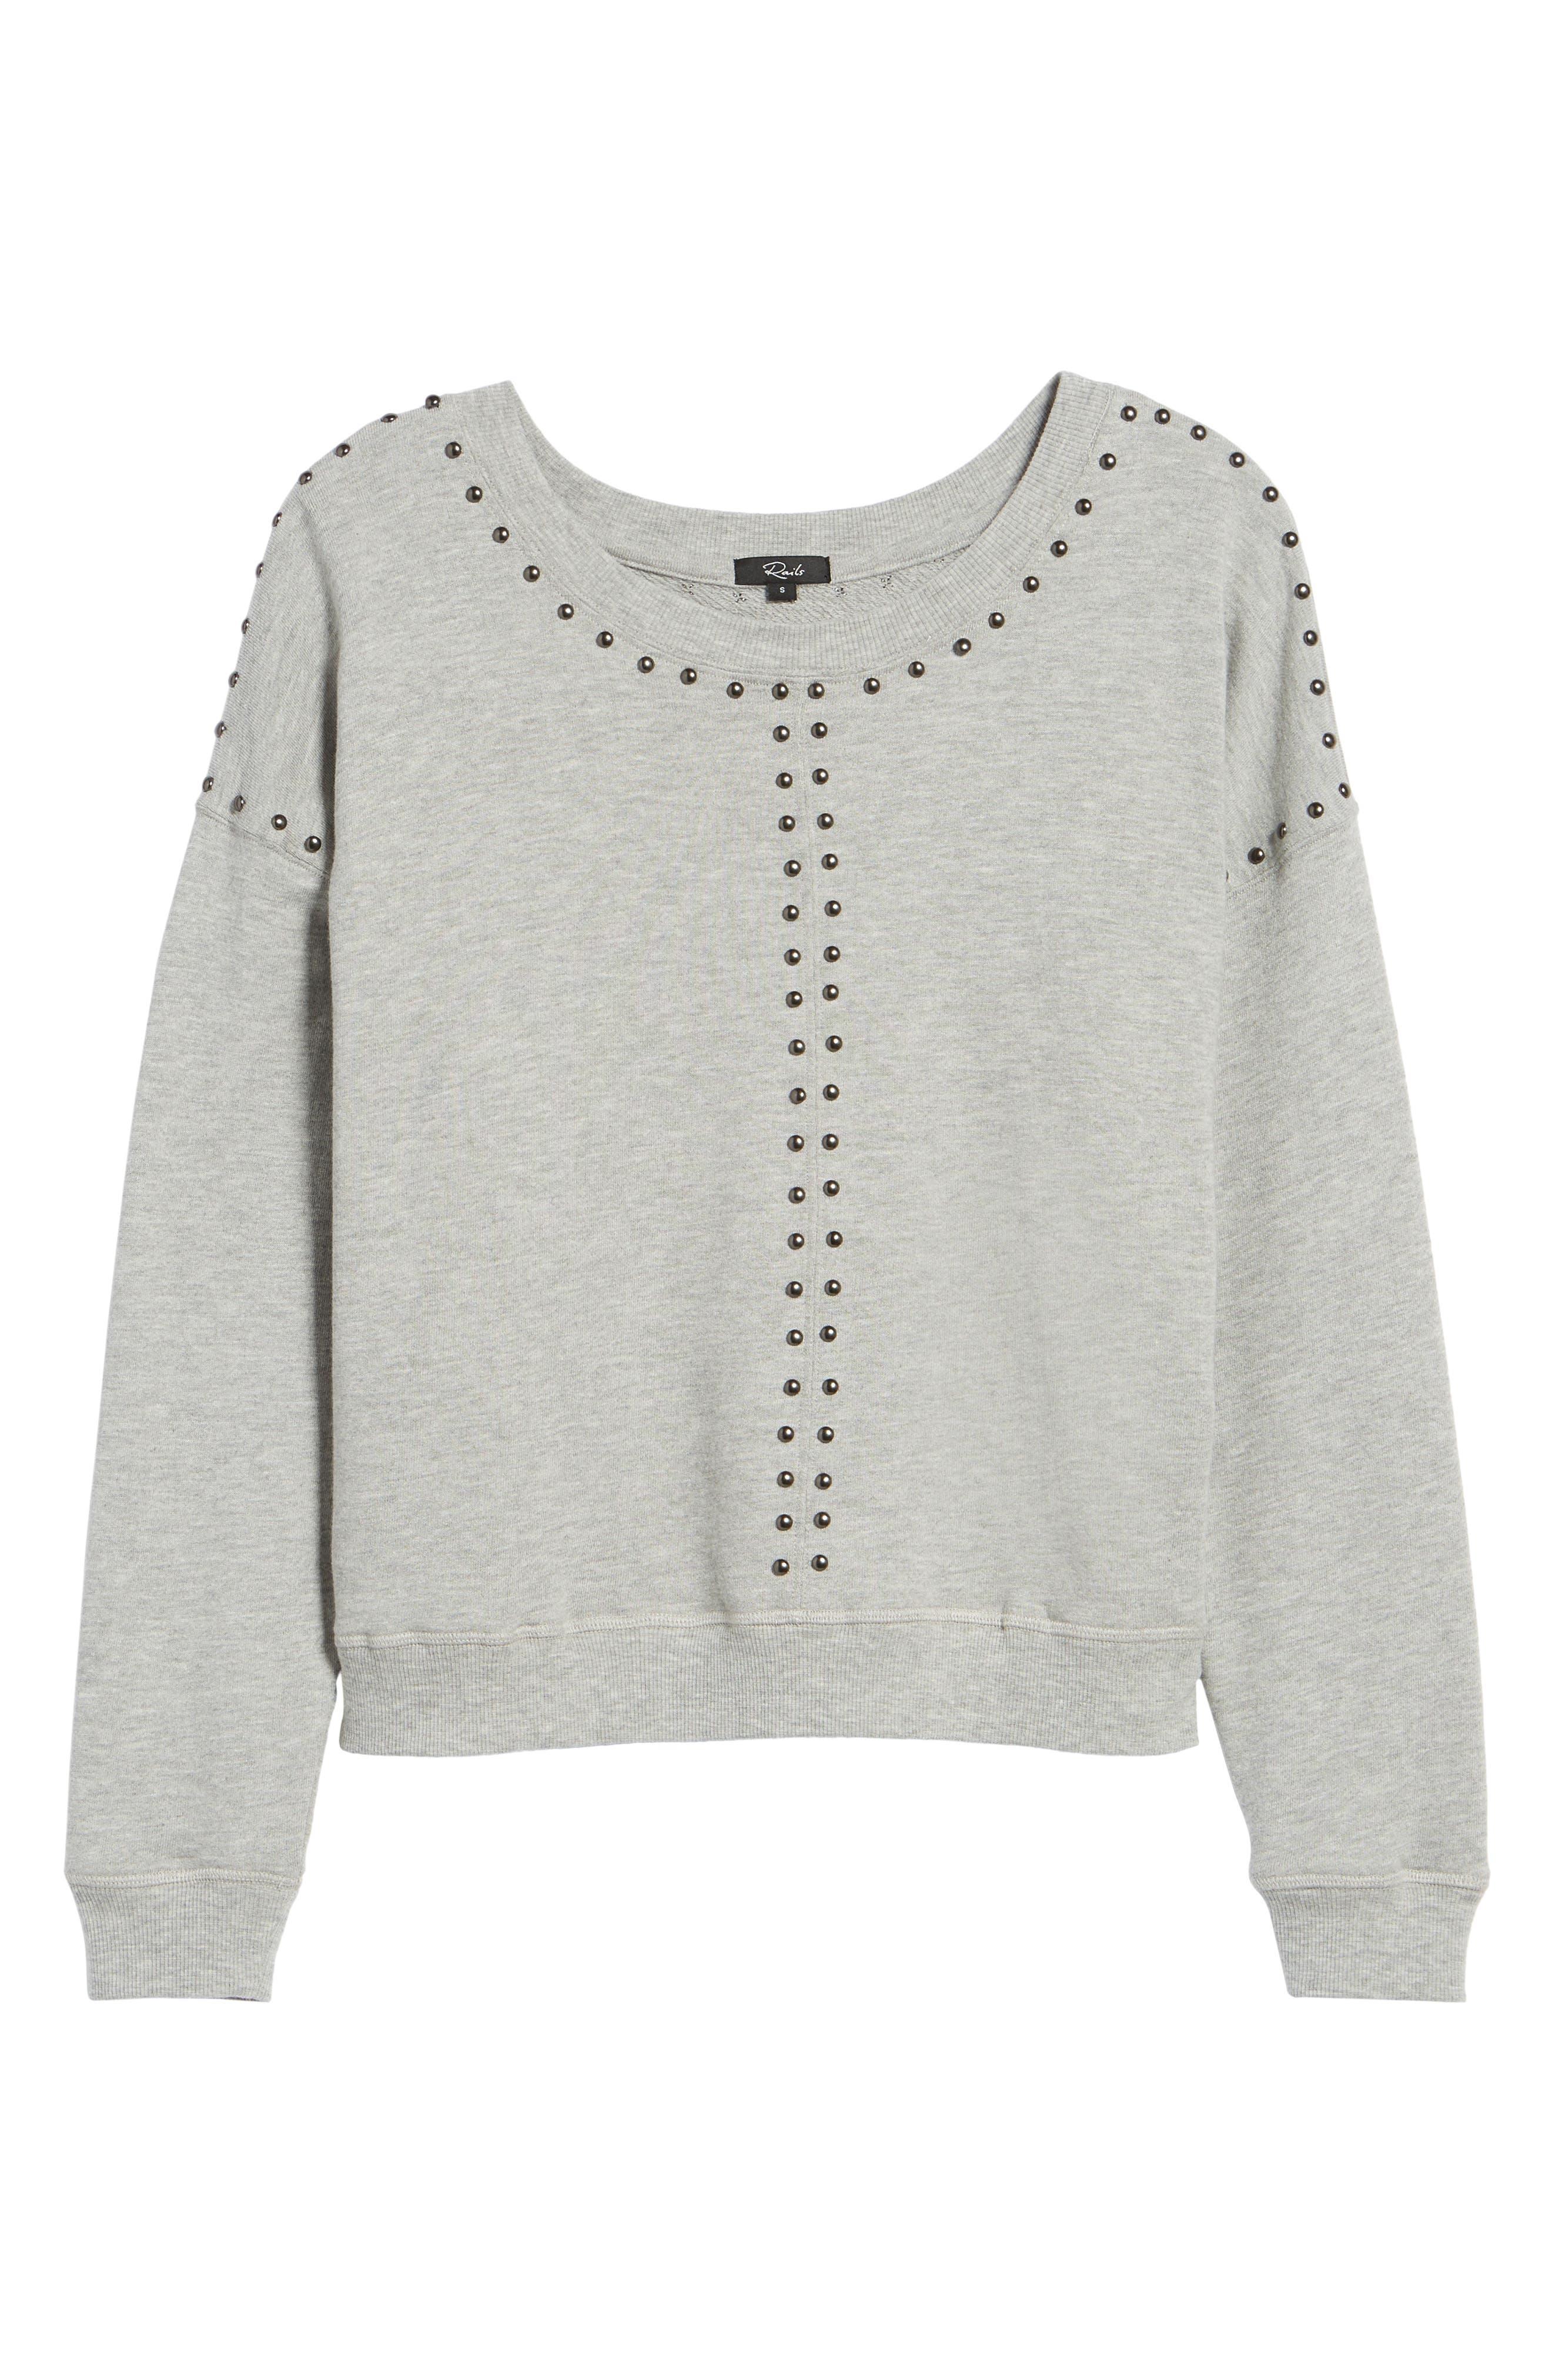 Wilson Studded Sweatshirt,                             Alternate thumbnail 6, color,                             Heather Grey